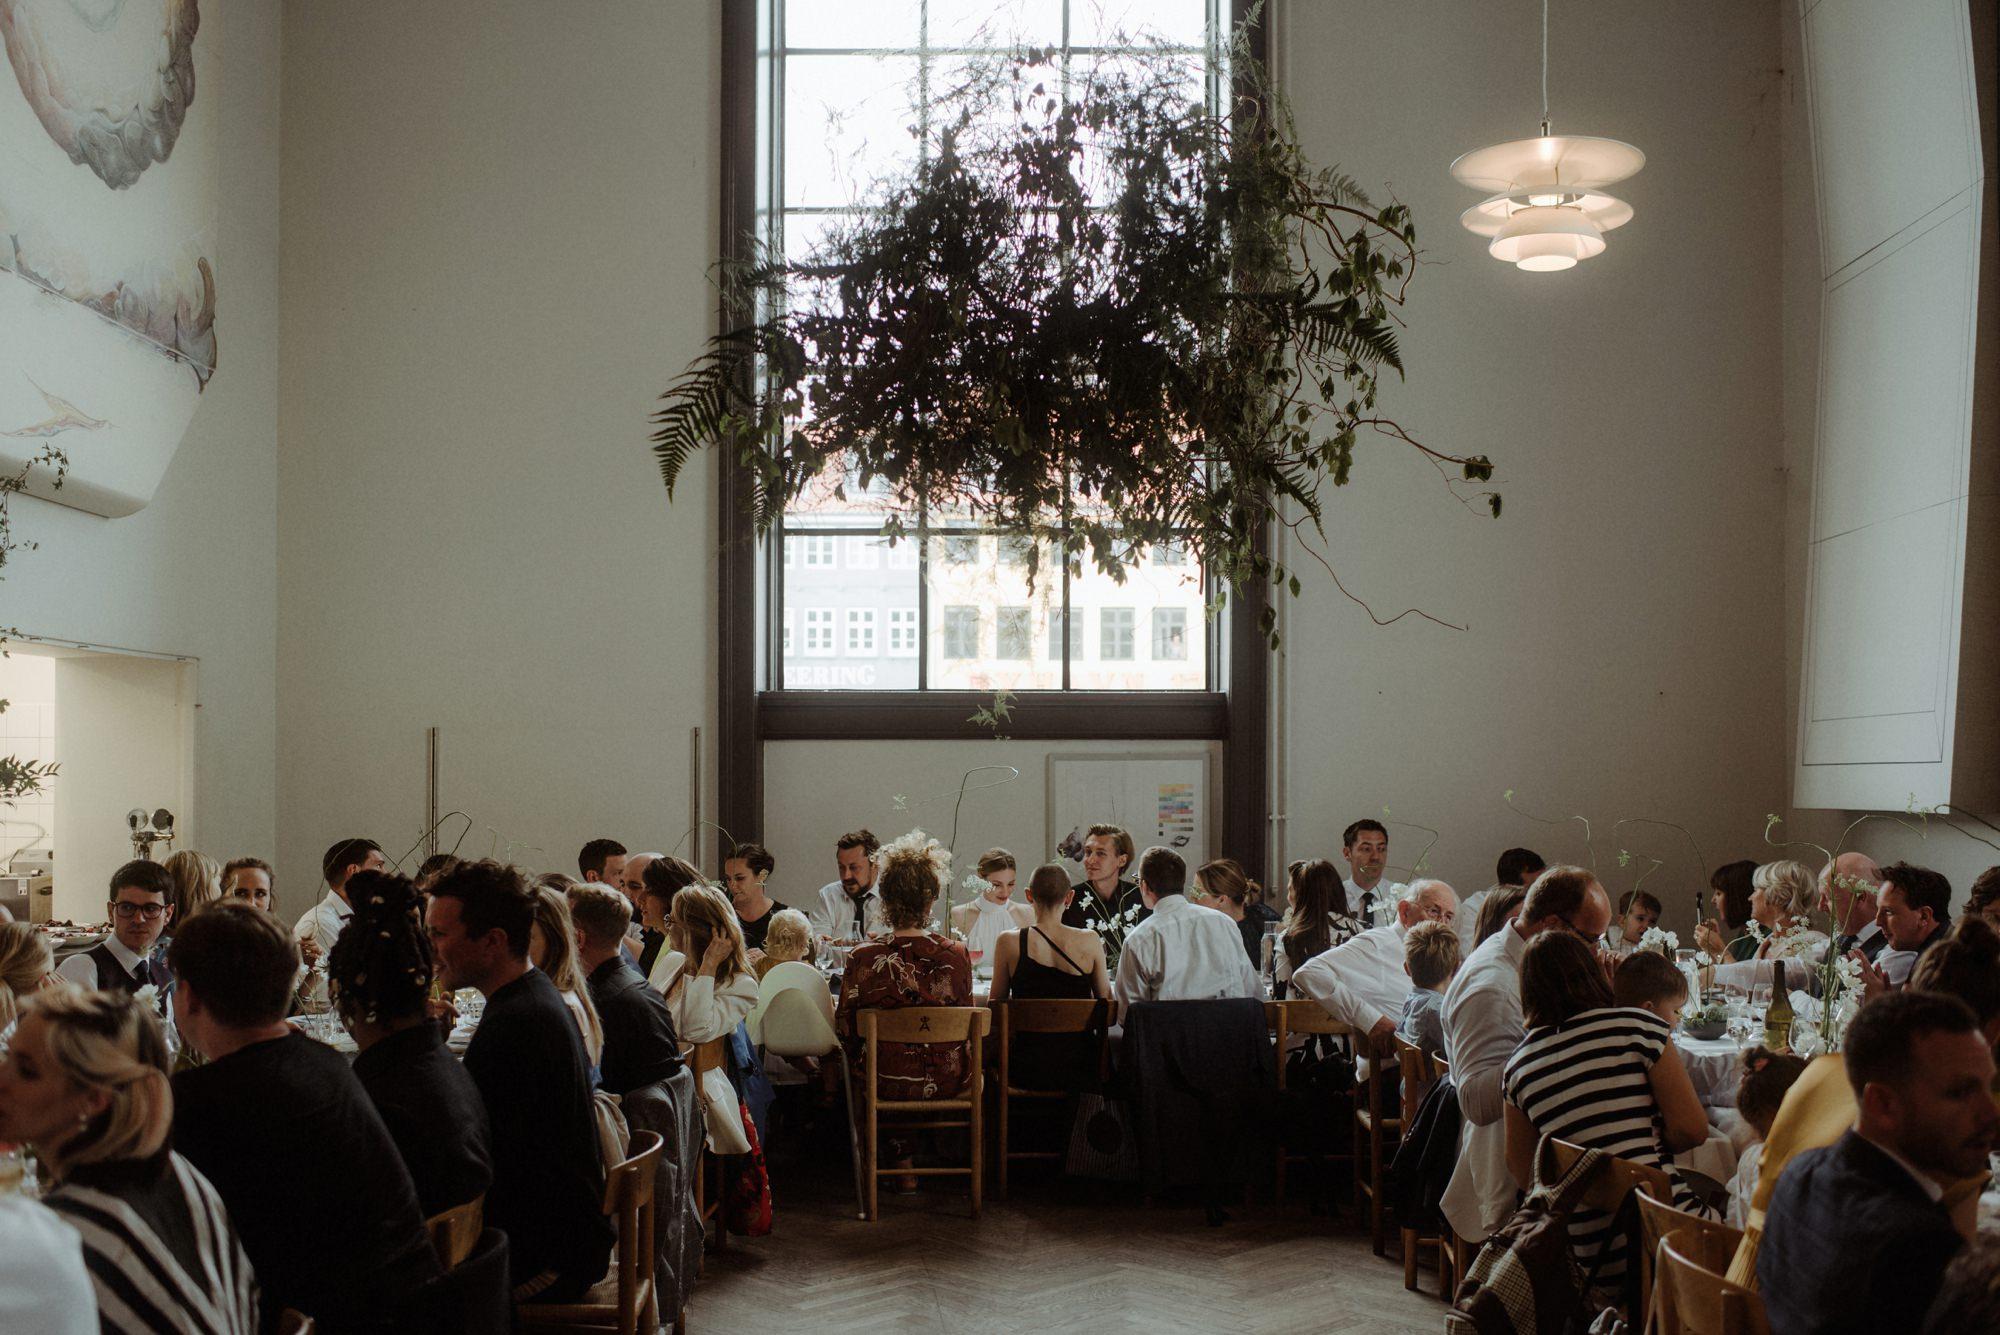 copenhagen wedding photography 0051 1